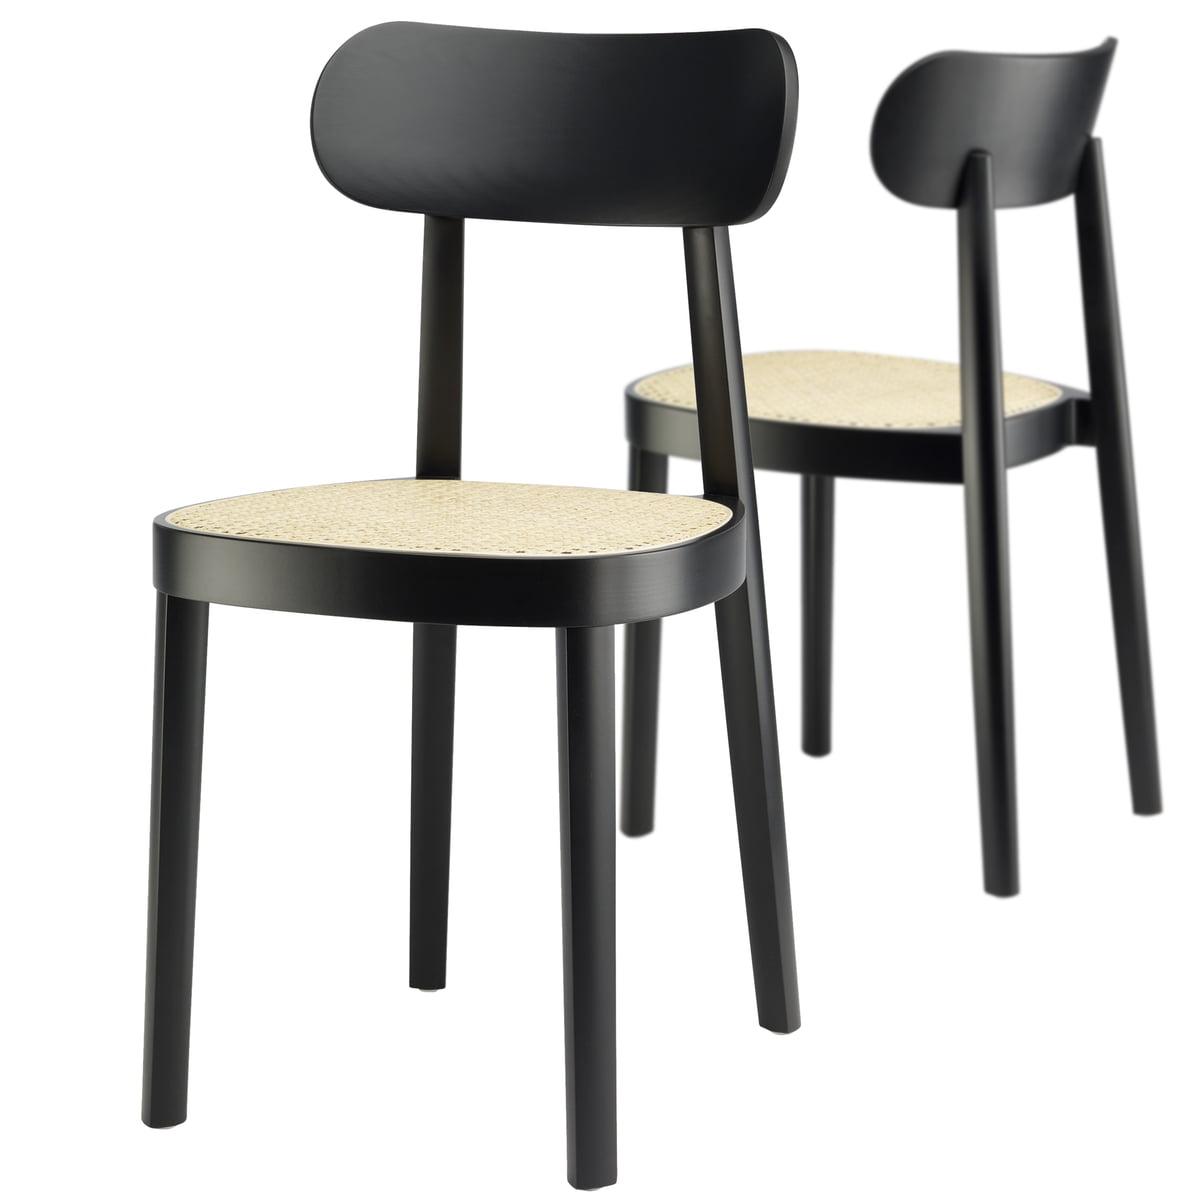 118 stuhl von thonet online shop for Stuhl thonet nachbau